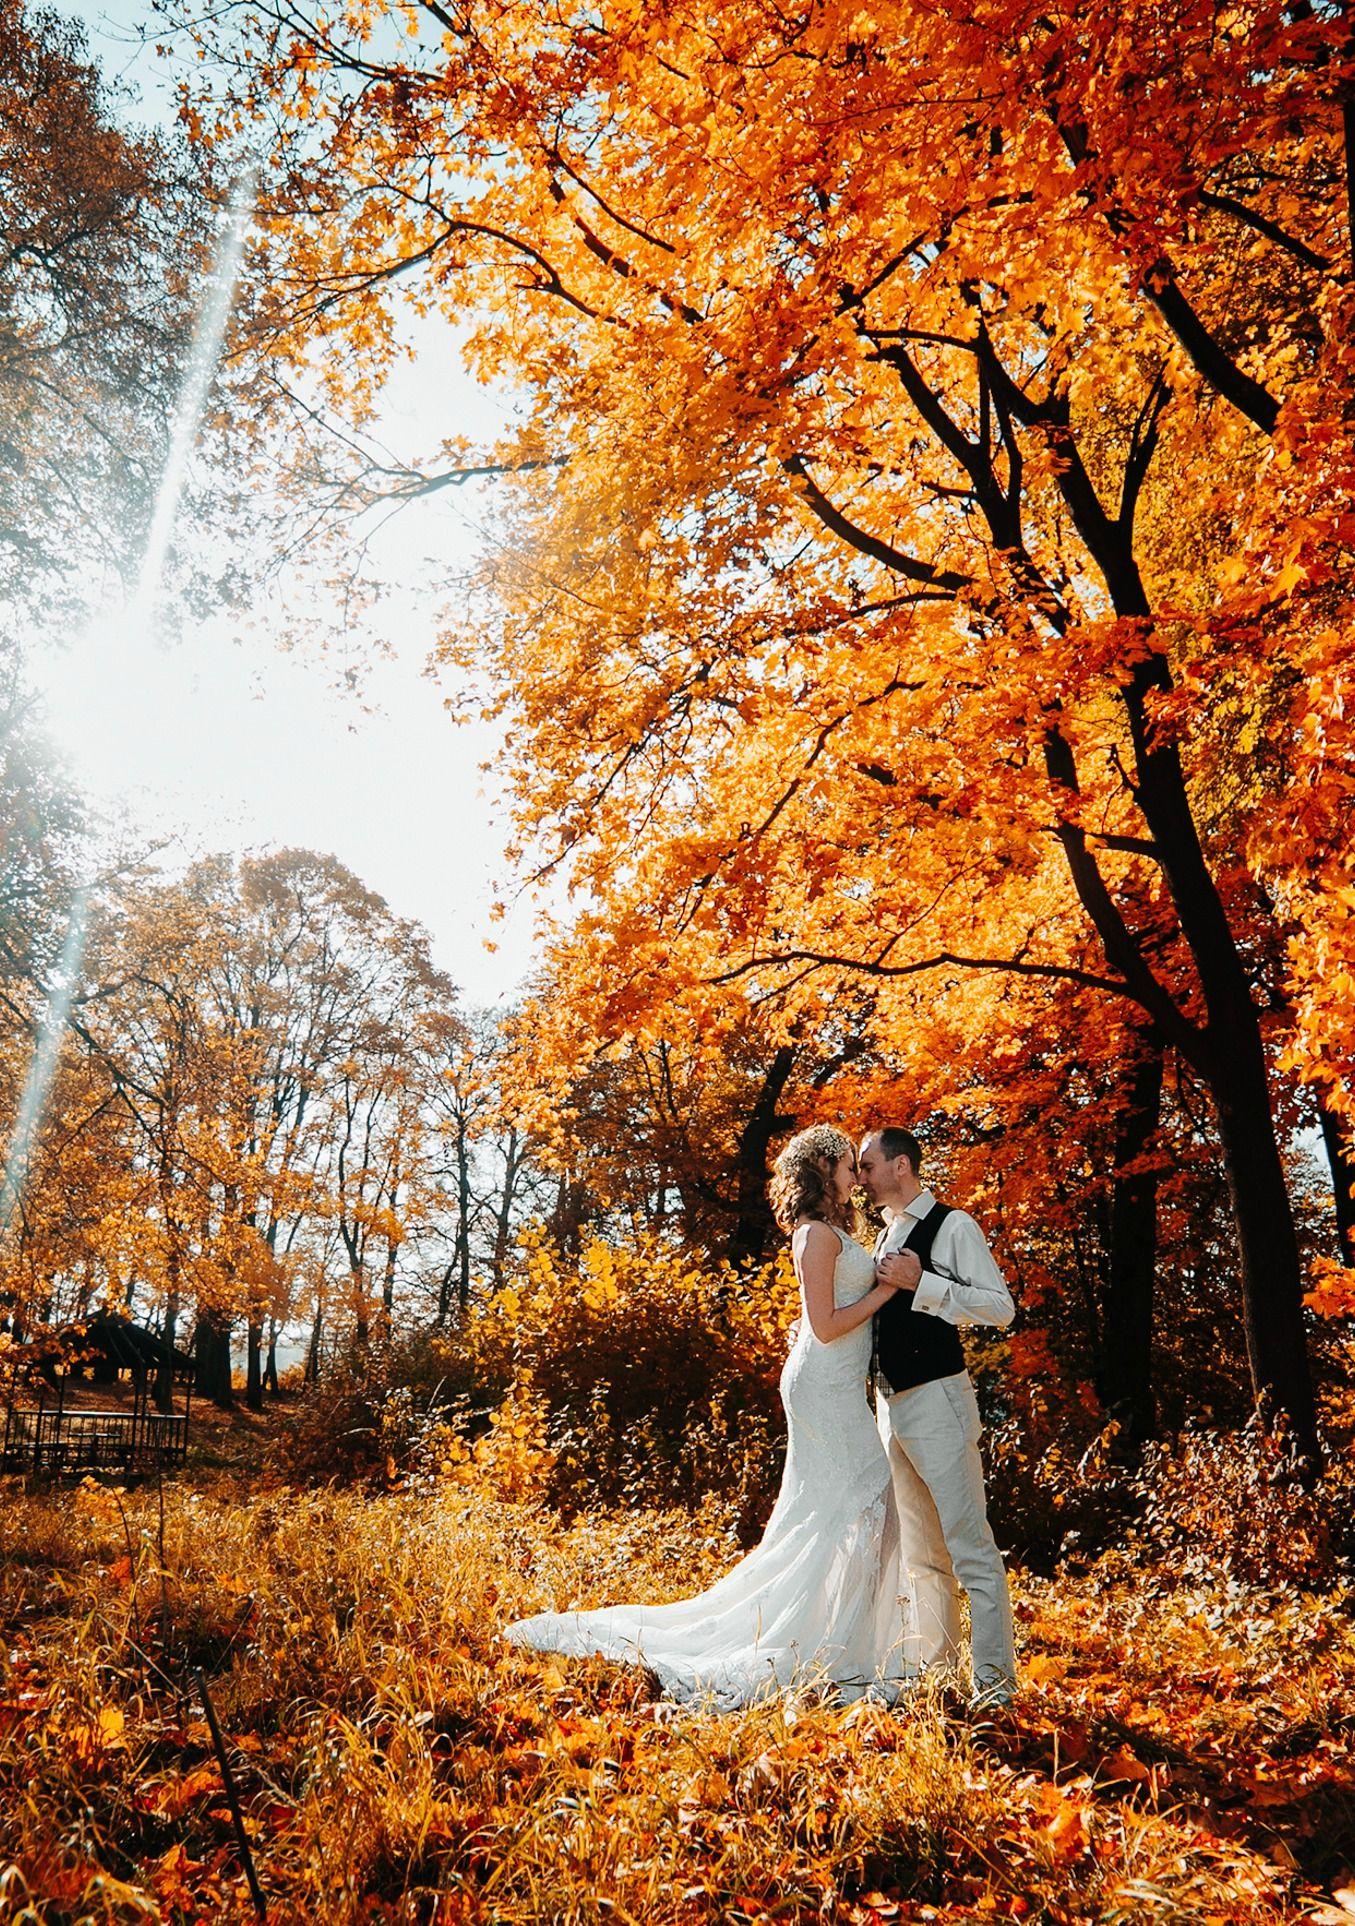 34 Photos That Ll Make You Want A Fall Wedding Fall Wedding Photos Fall Wedding Photography Outdoor Fall Wedding